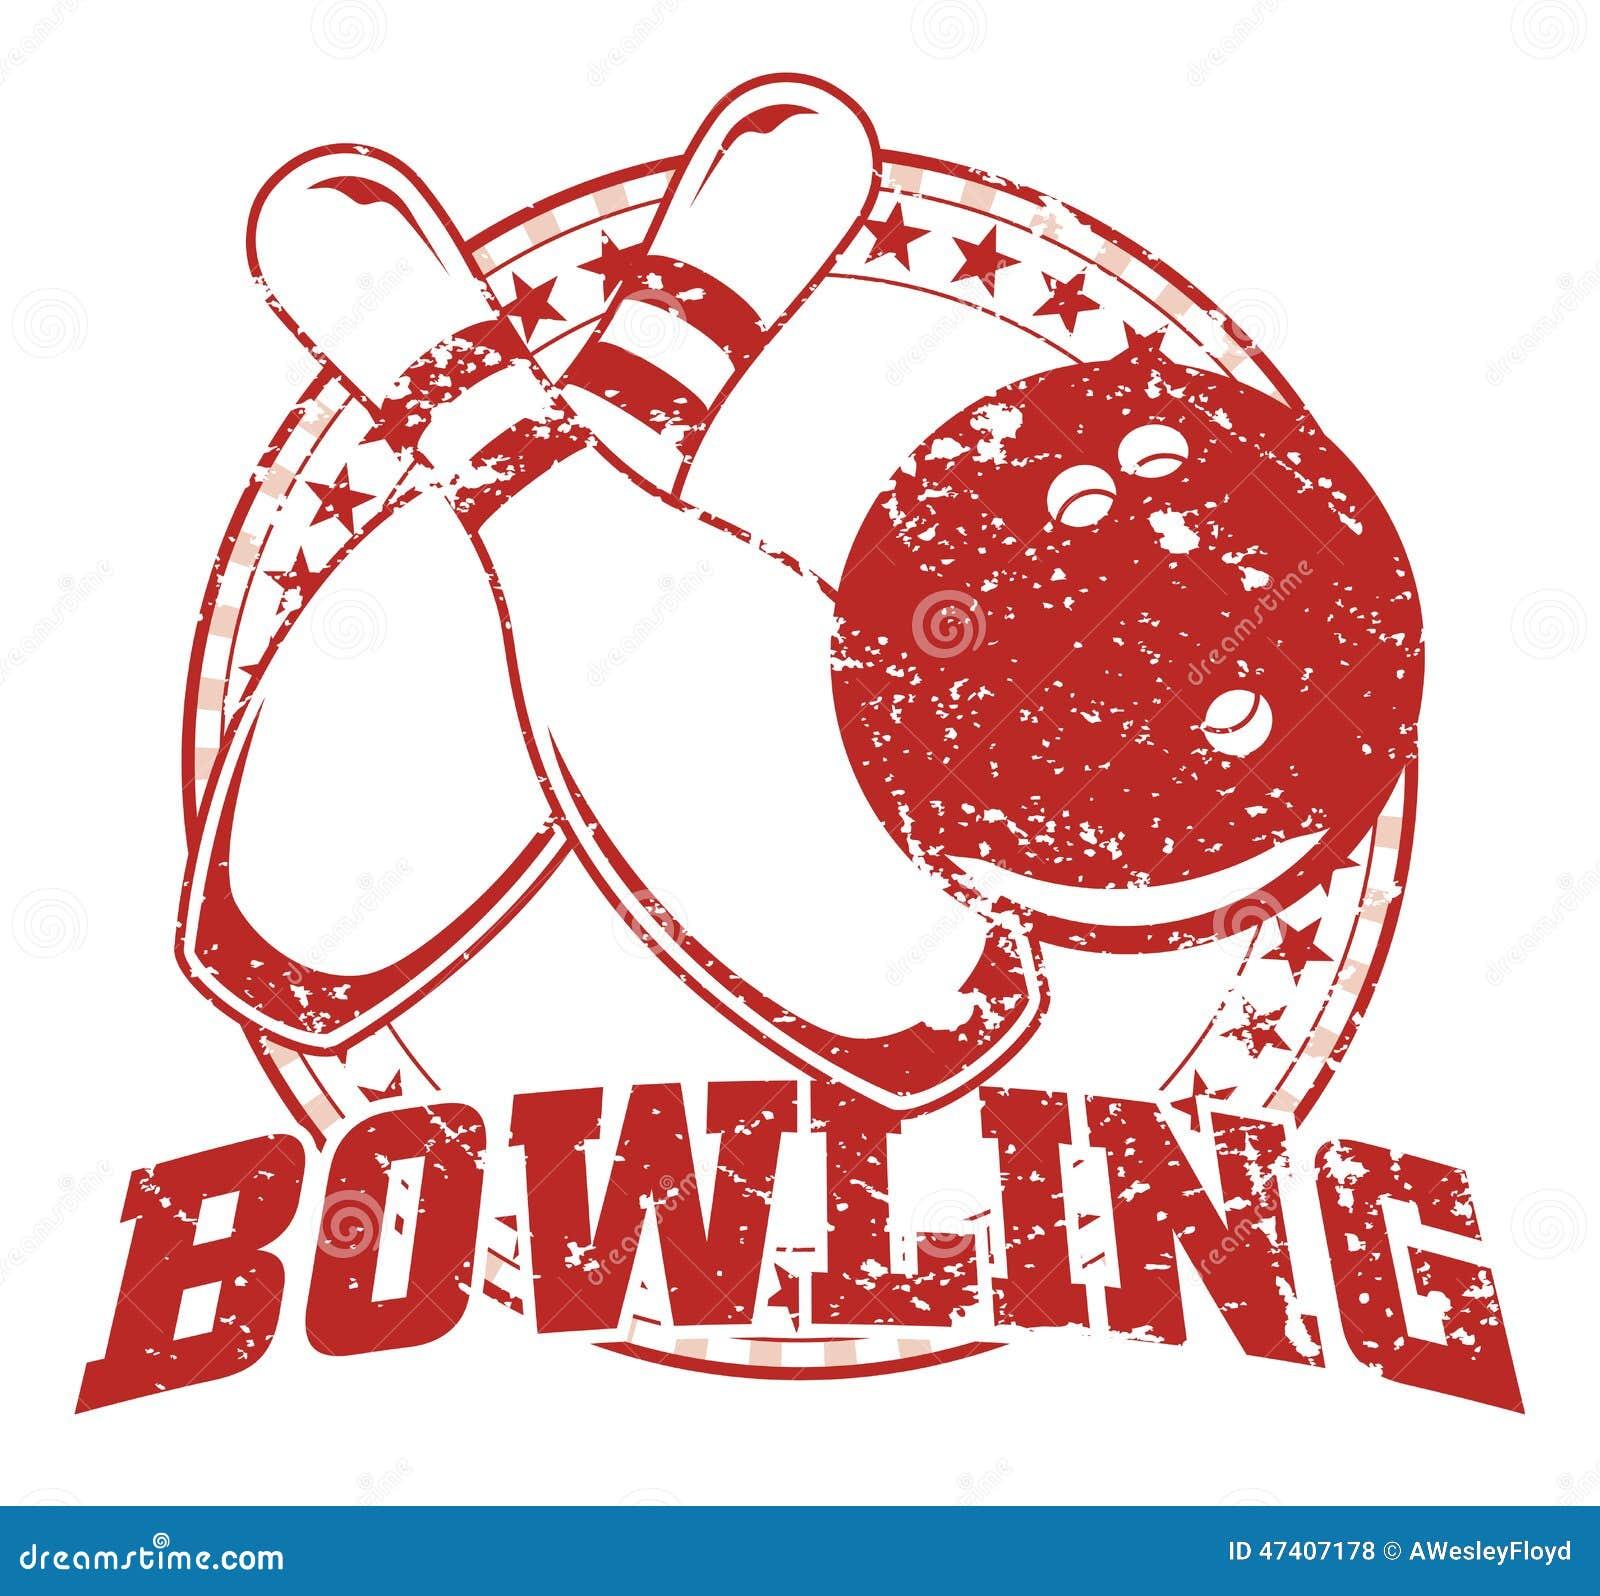 Bowling Design - Vintage Stock Vector - Image: 47407178